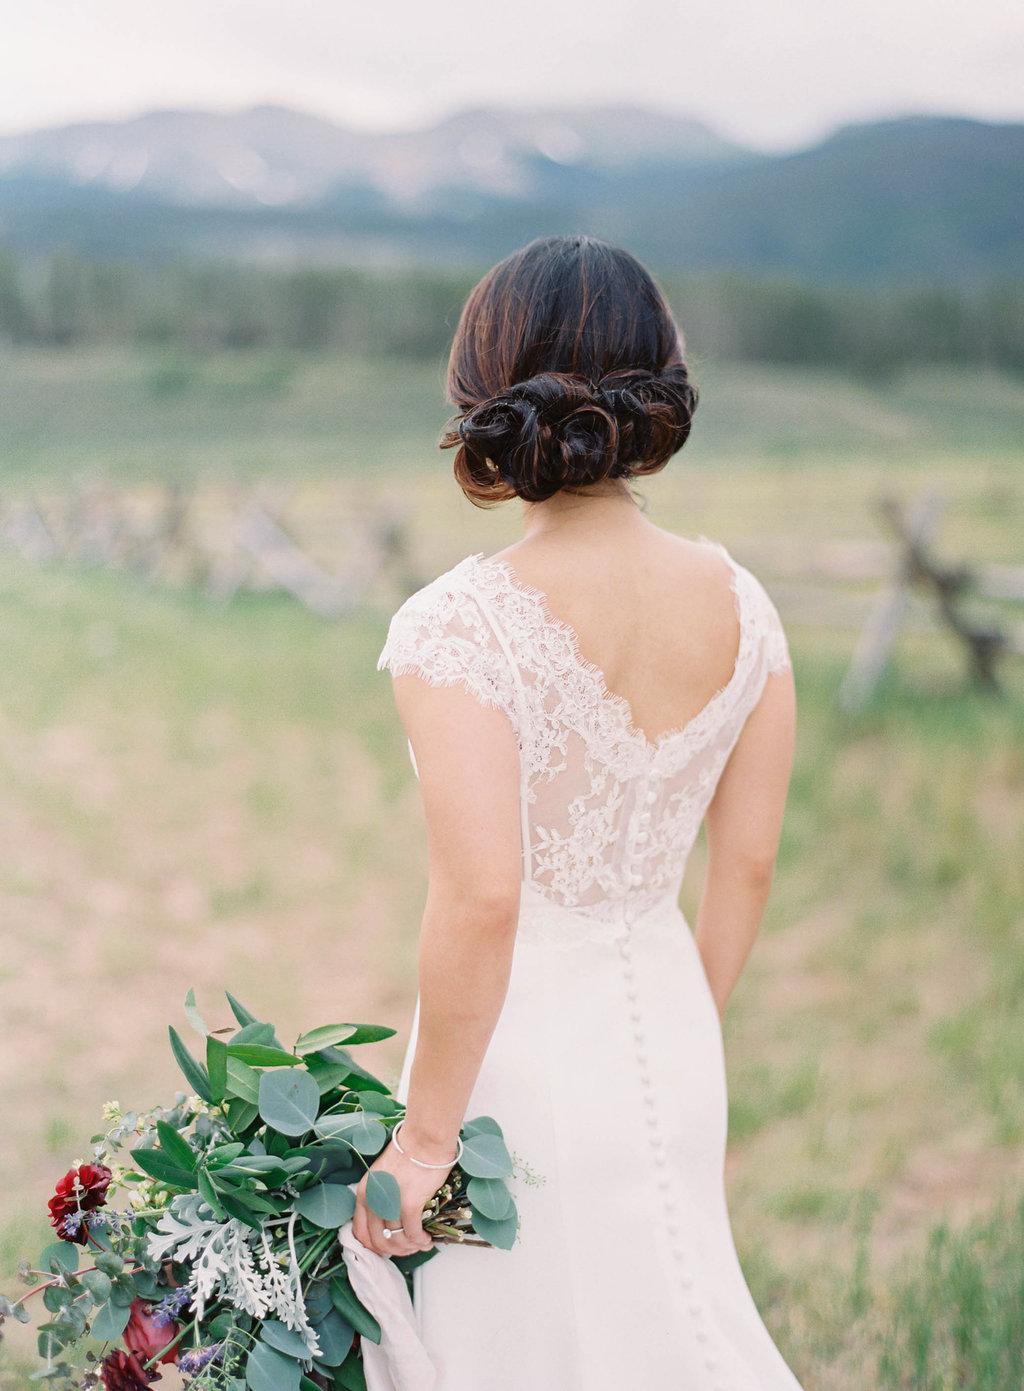 Jennifer | Megan Wynn Photography